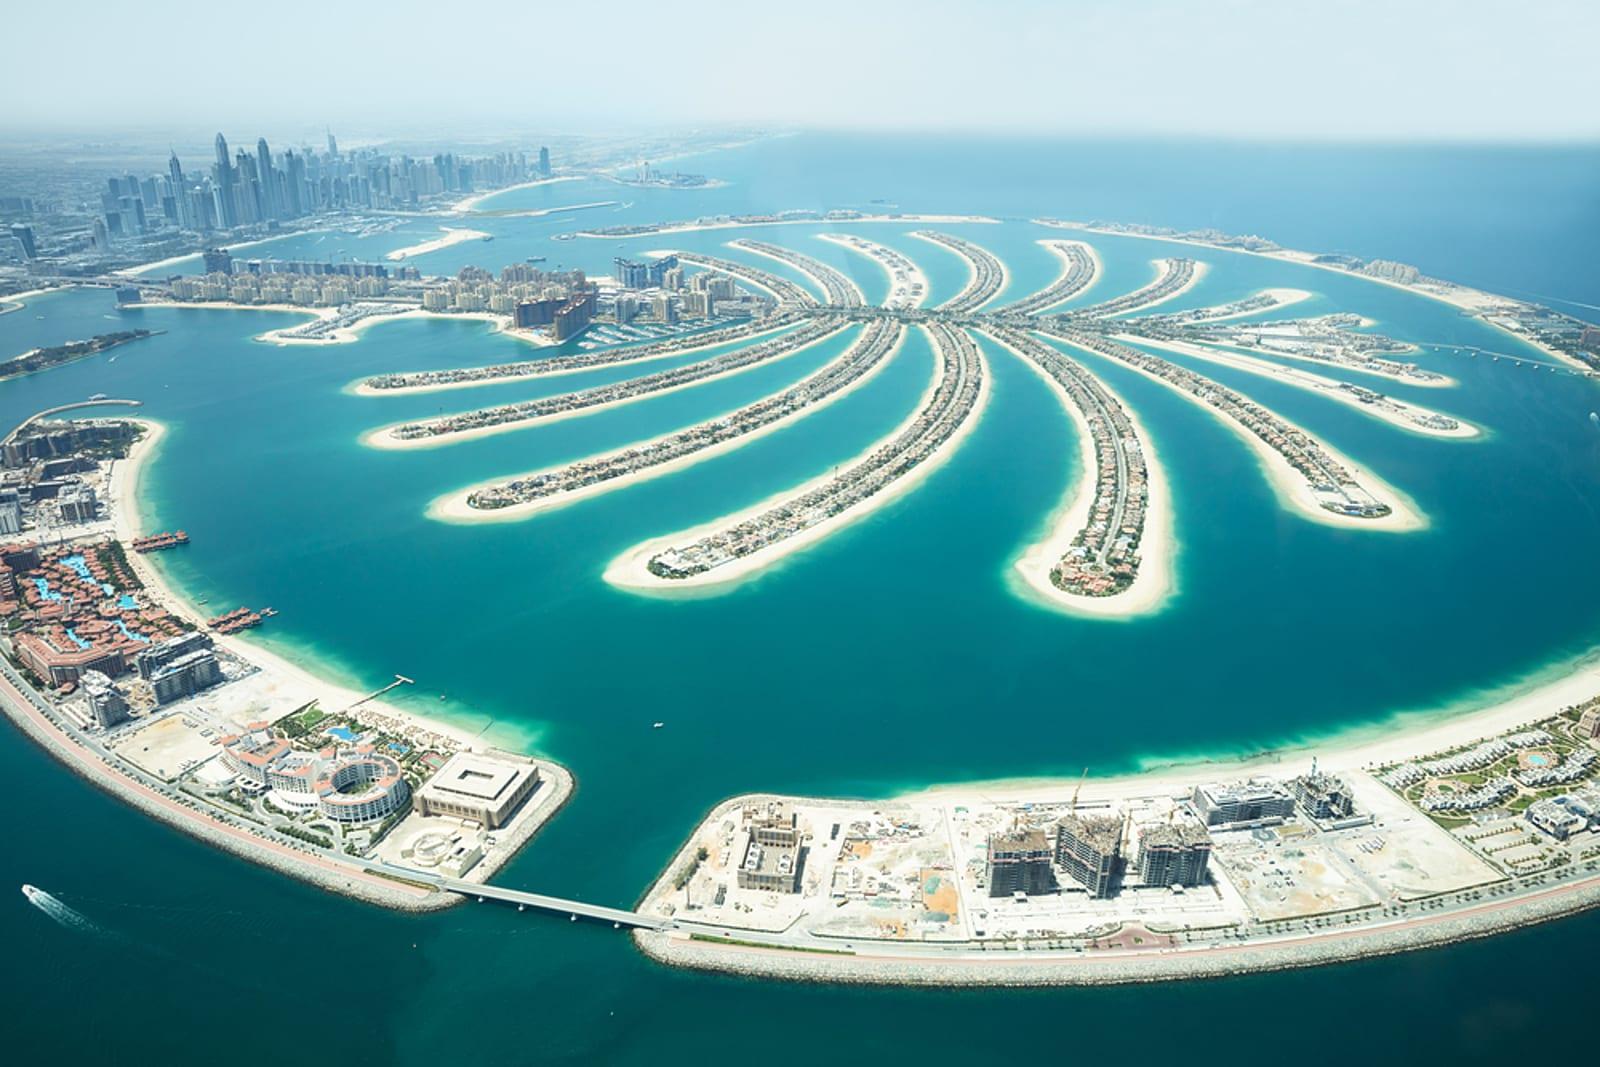 Palm Jumeirah Dubai